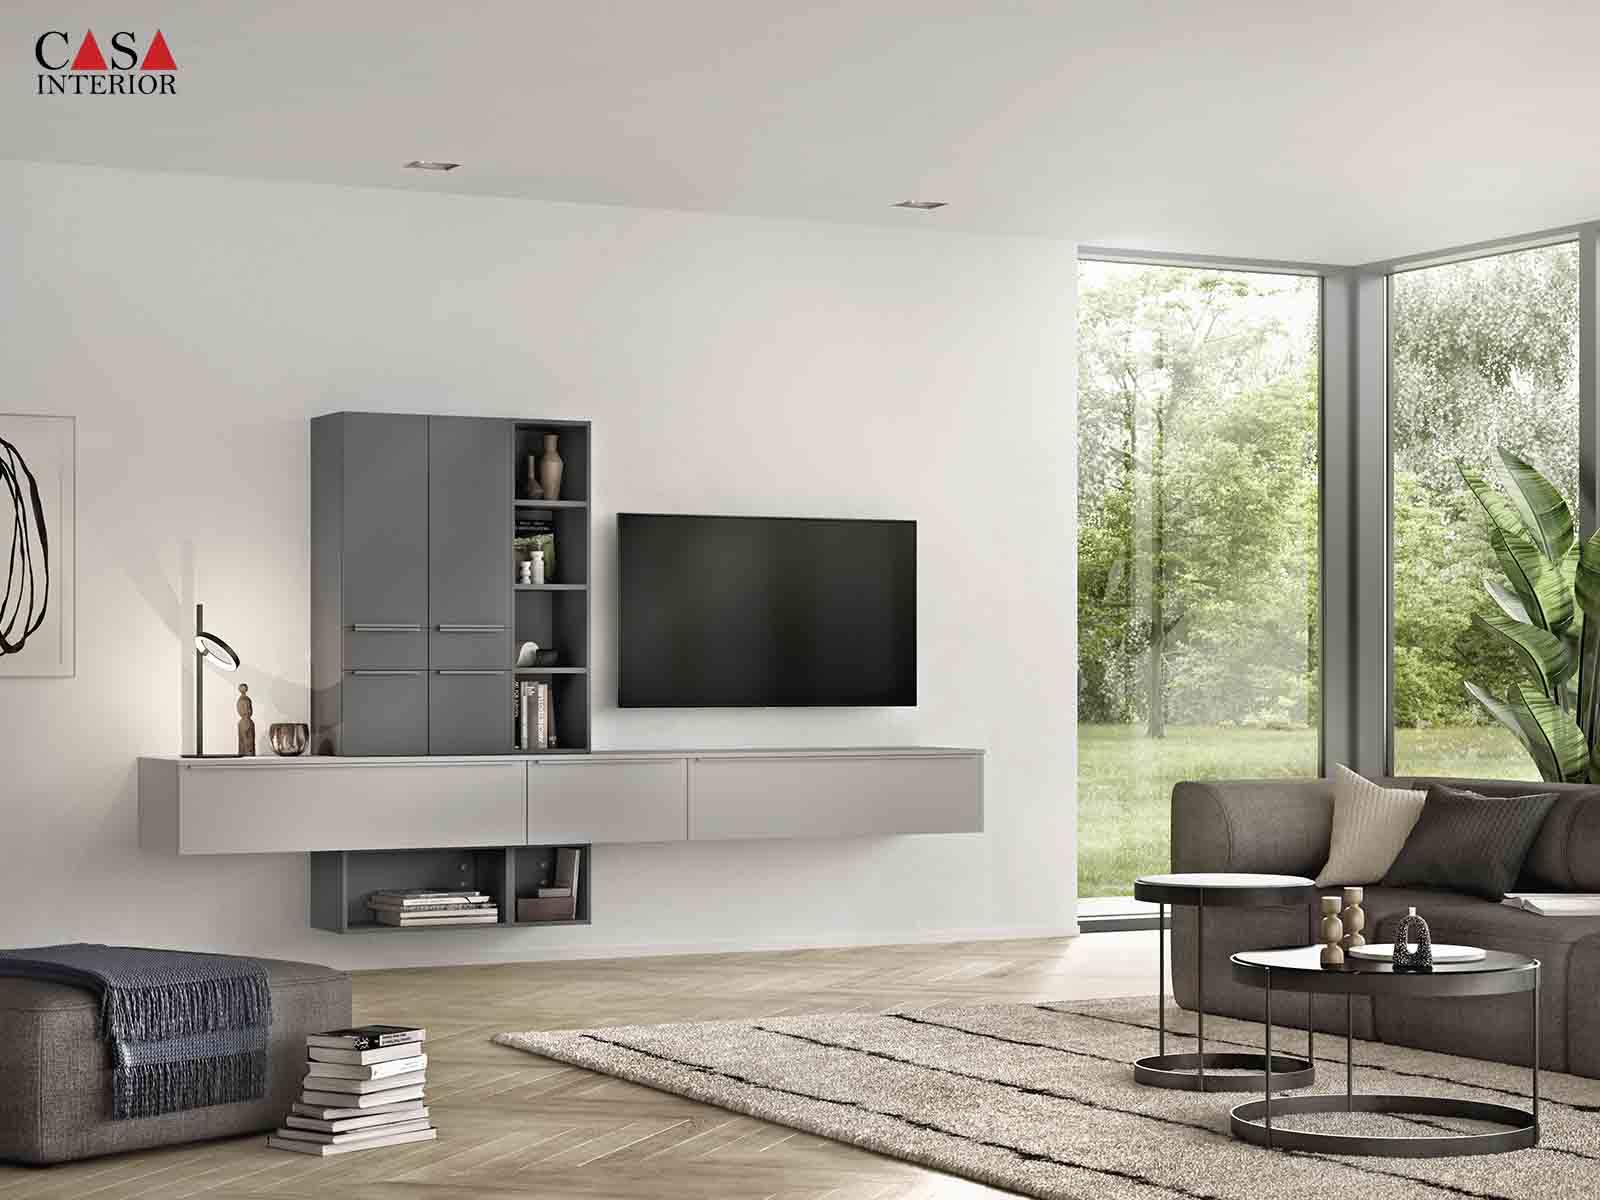 Küchentime - Livingrooms - Living atmosphere